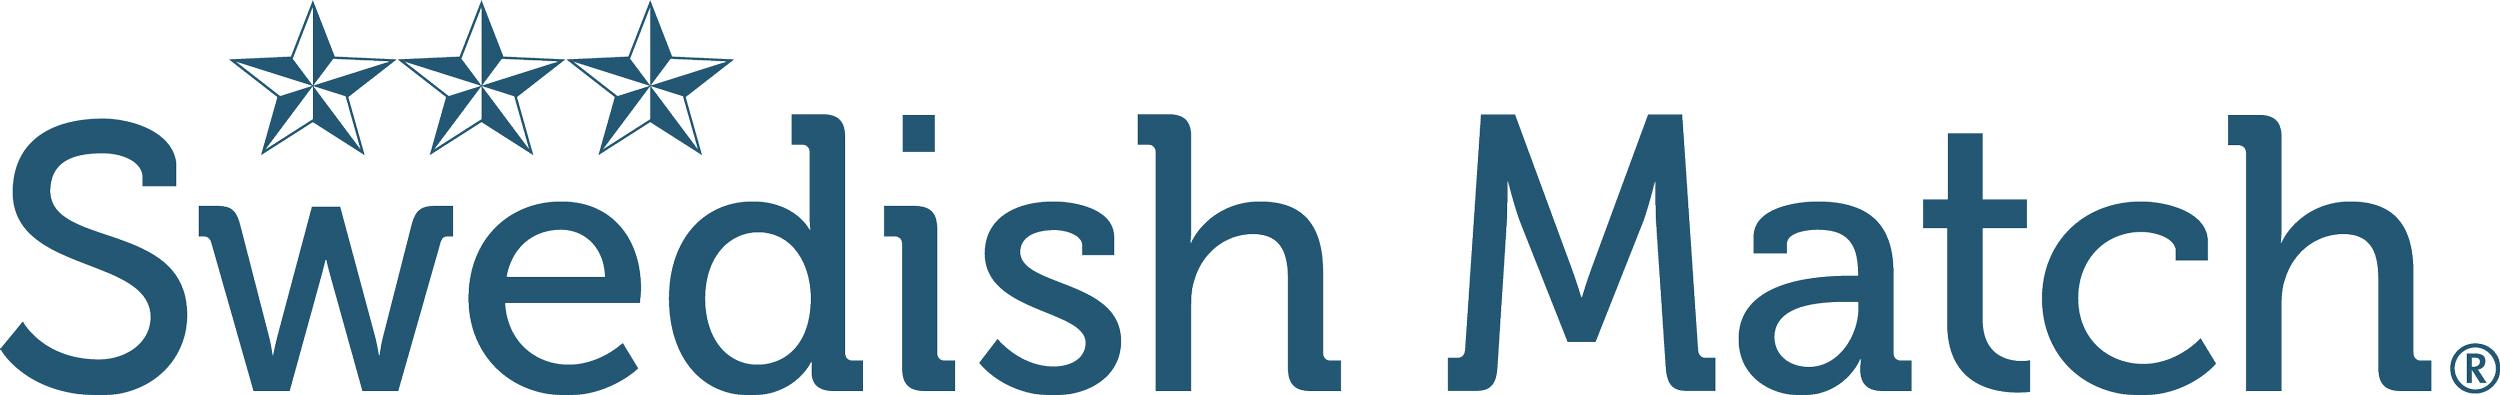 Swedish Match North America LLC logo